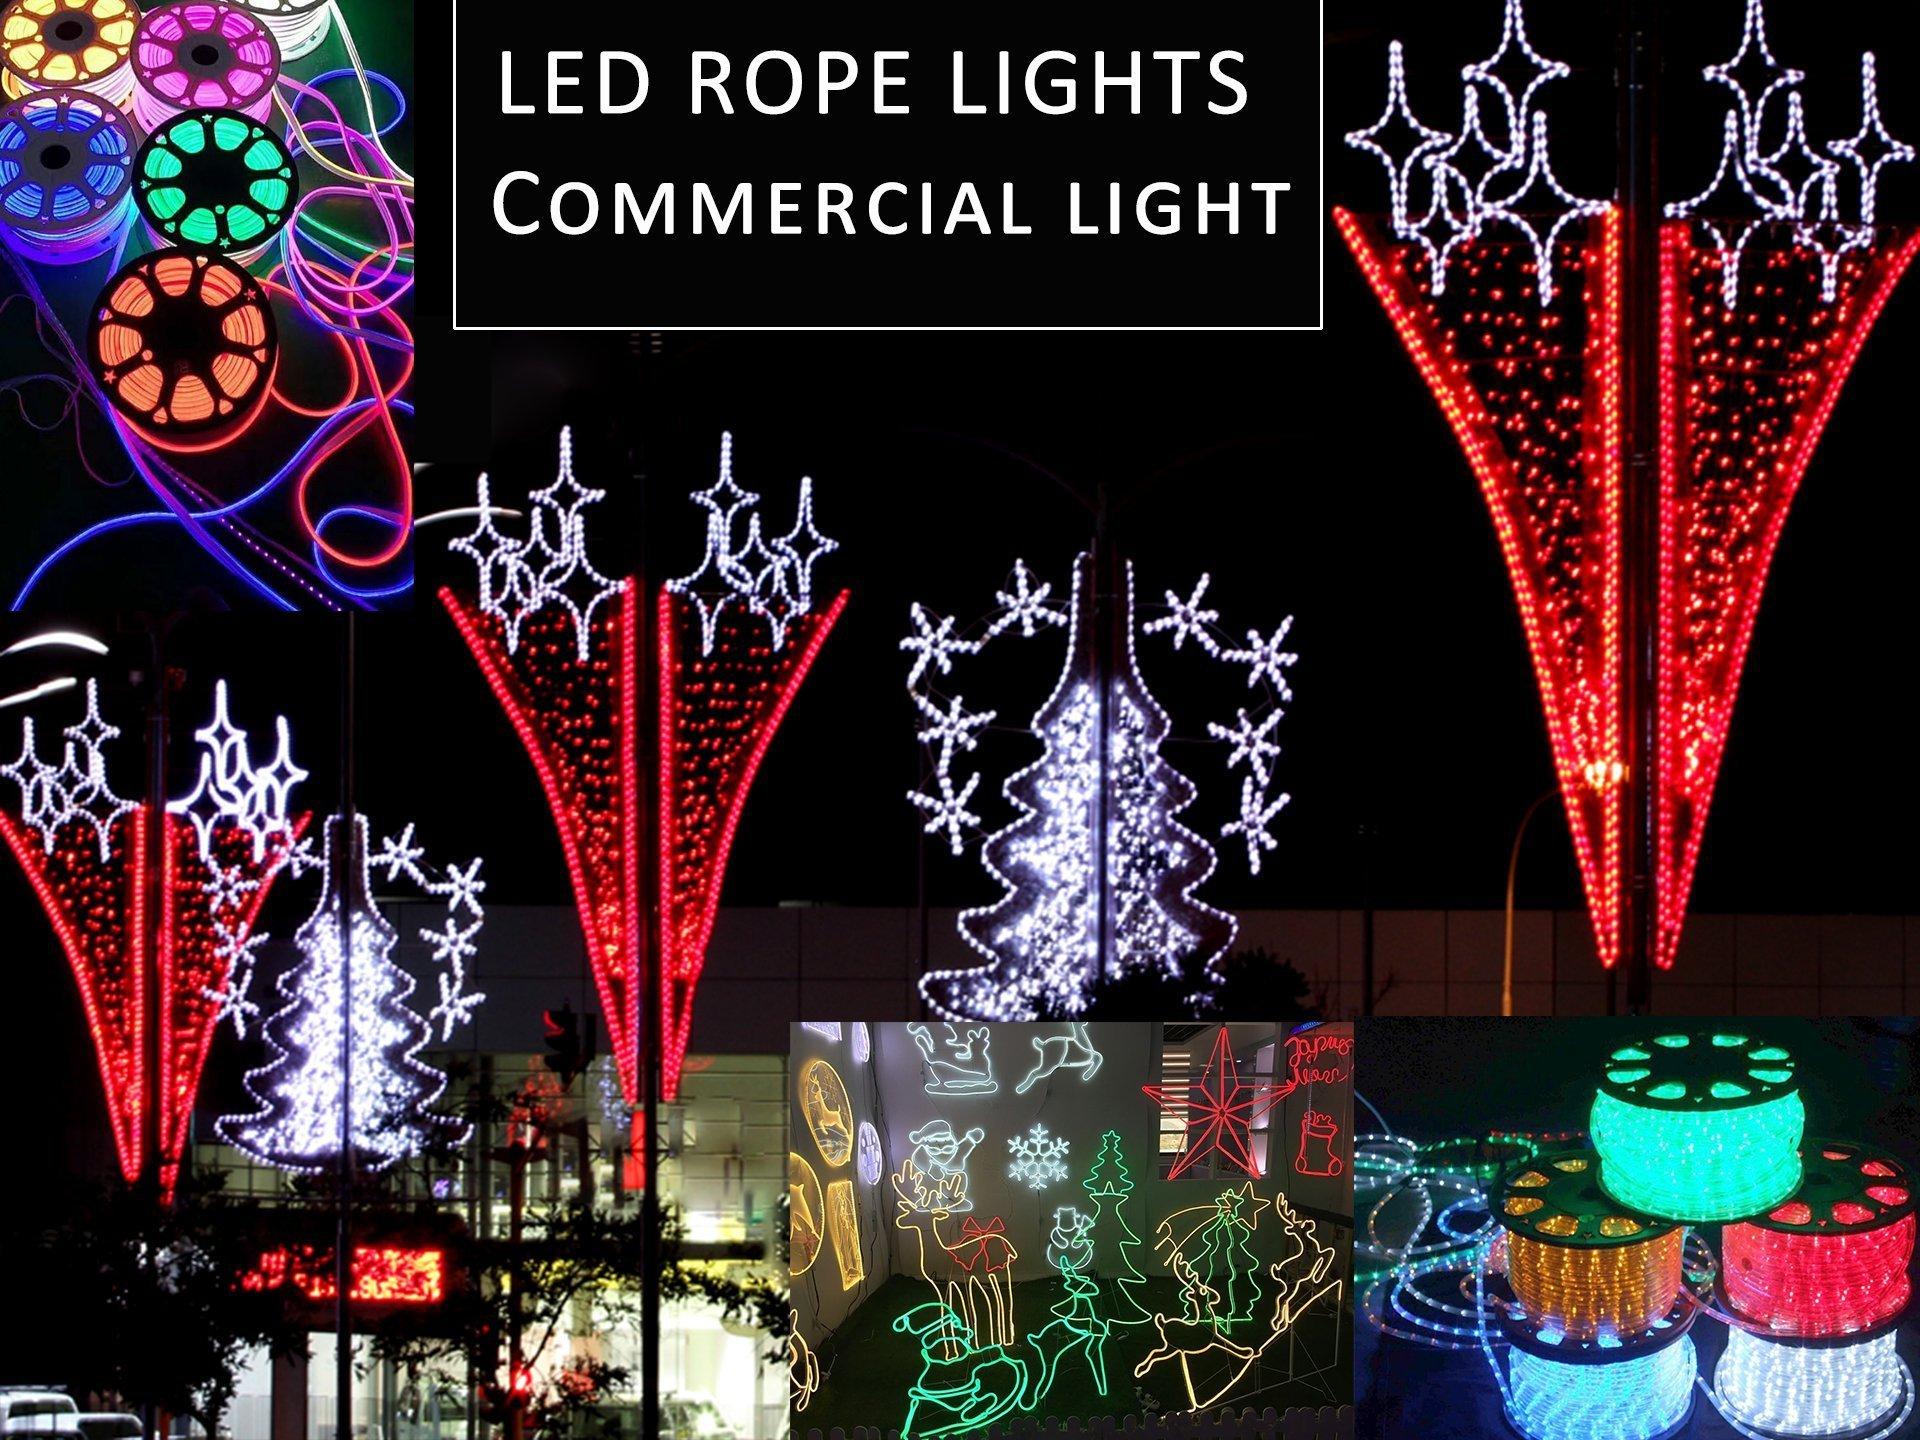 LED rope lights motif pole mounted Christmas decor